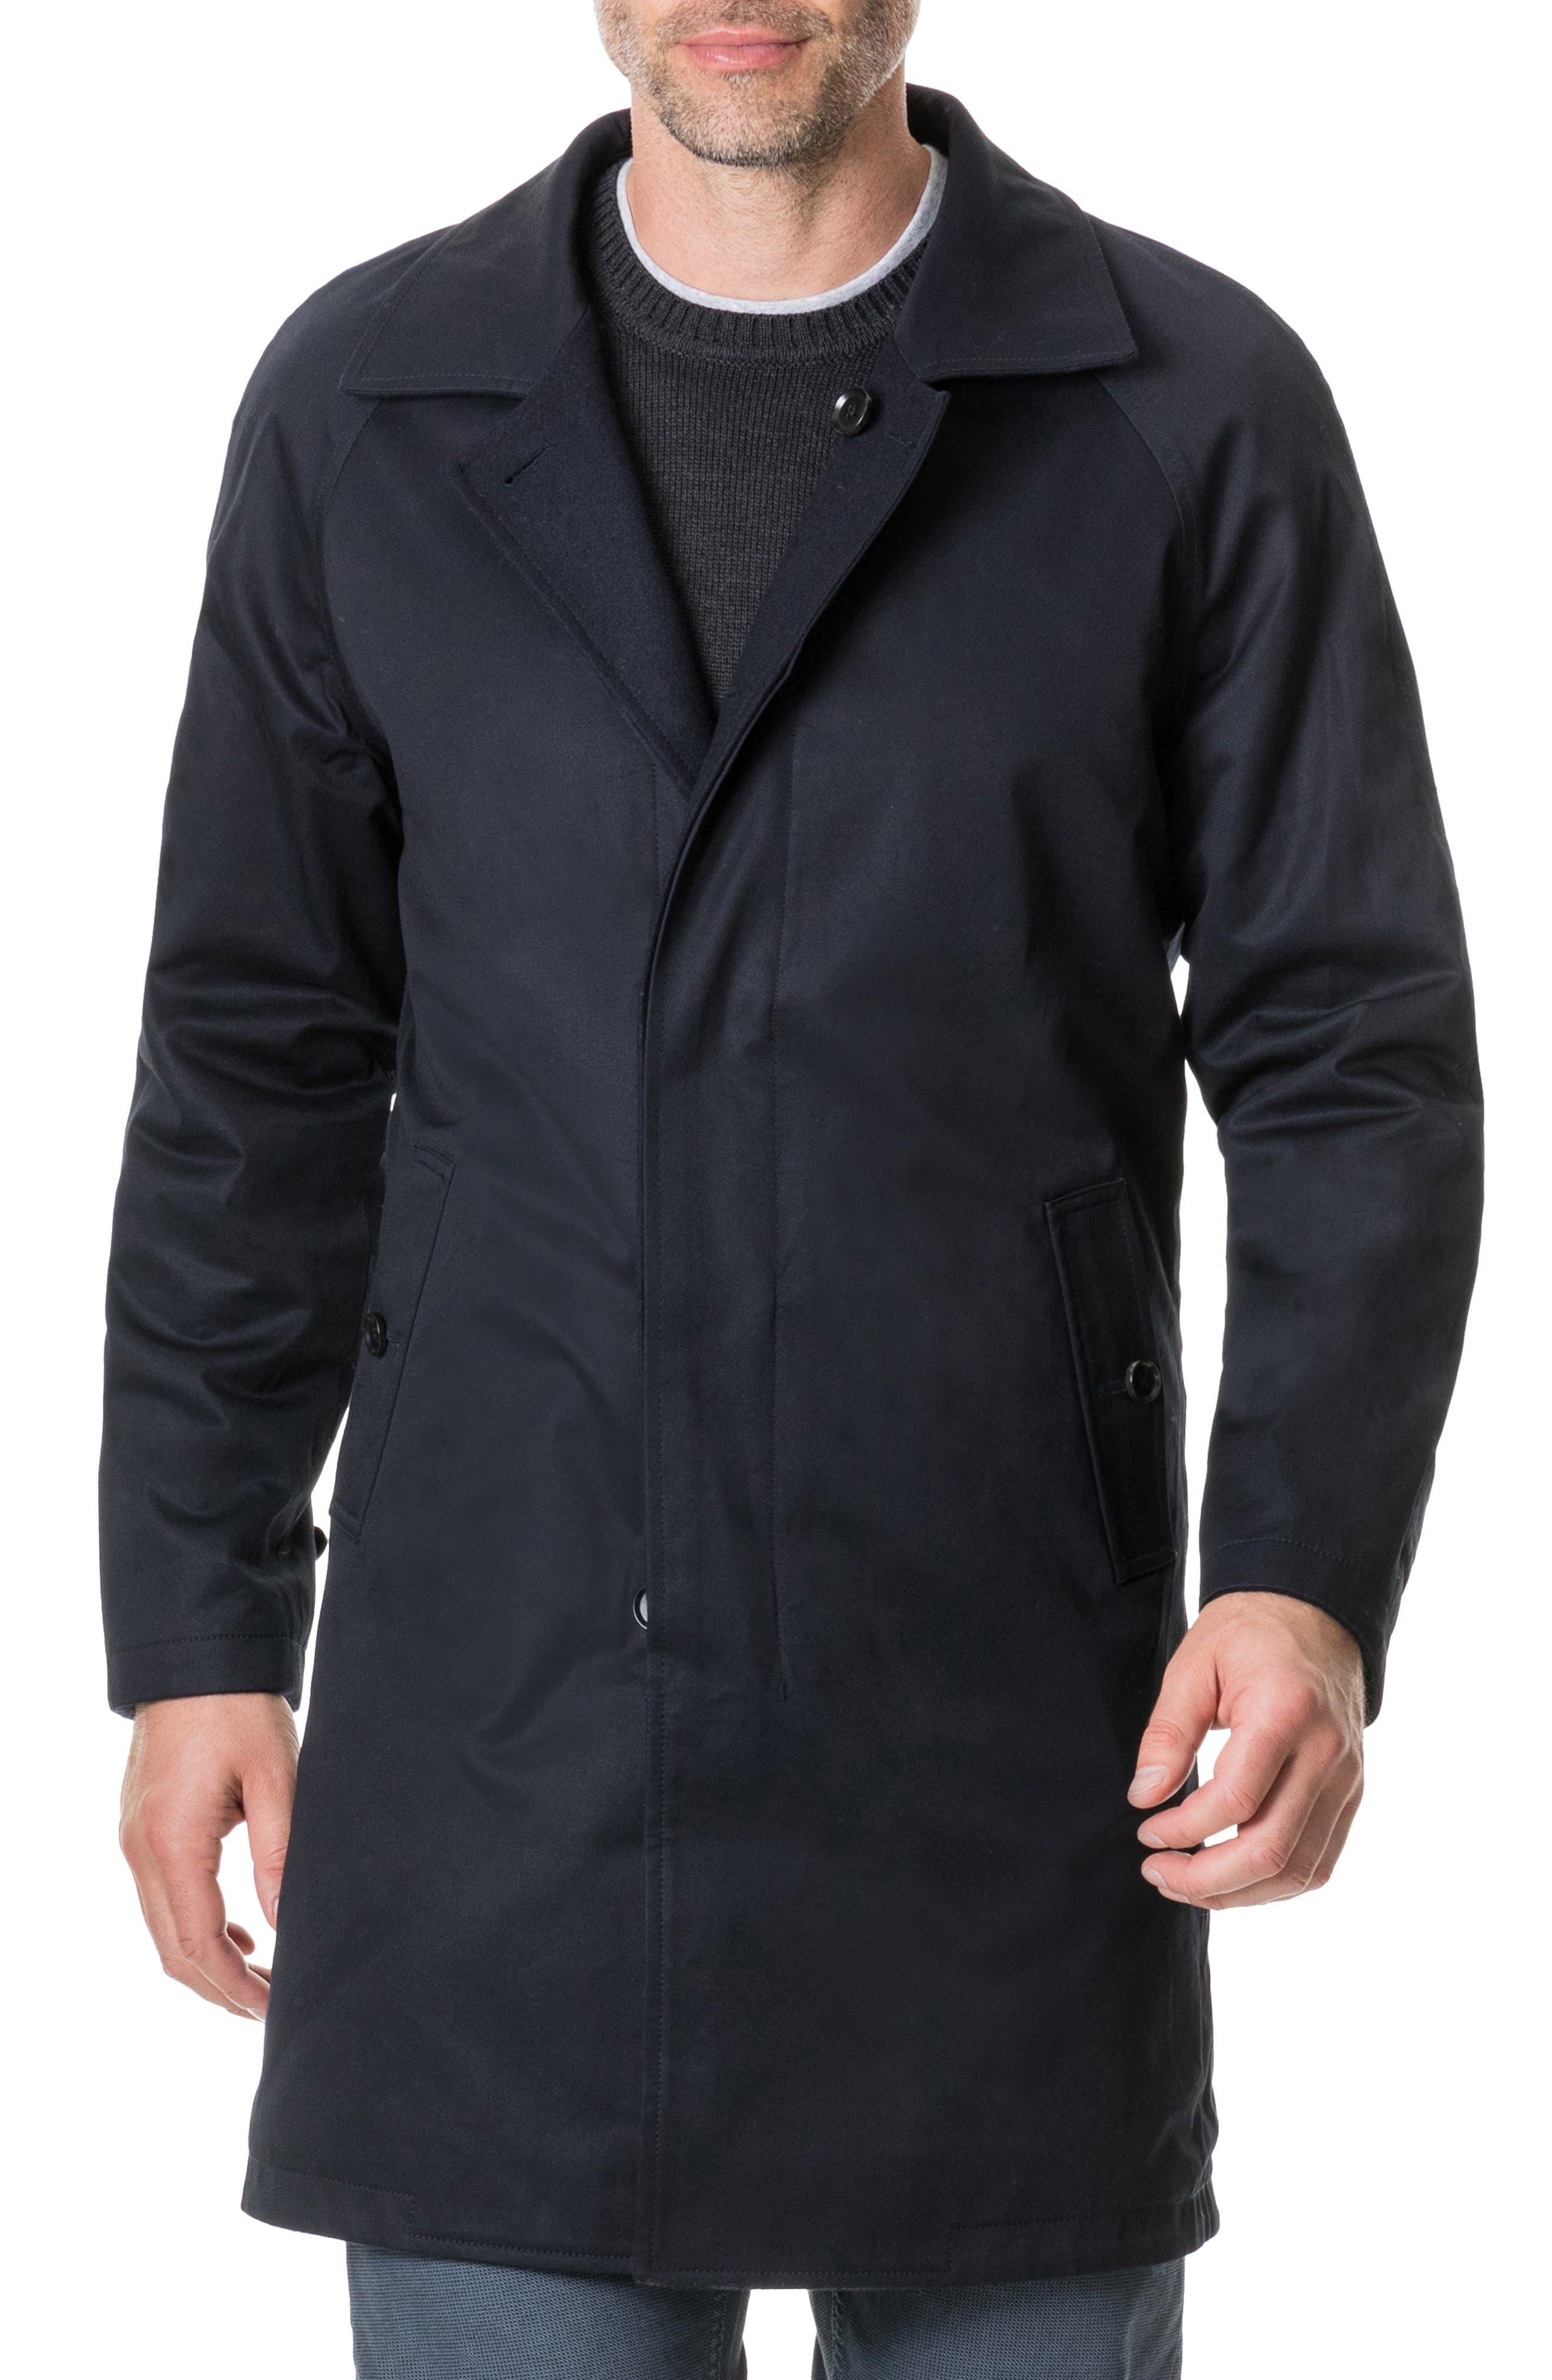 Templars Island Reversible Overcoat,                         Main,                         color, CHARCOAL